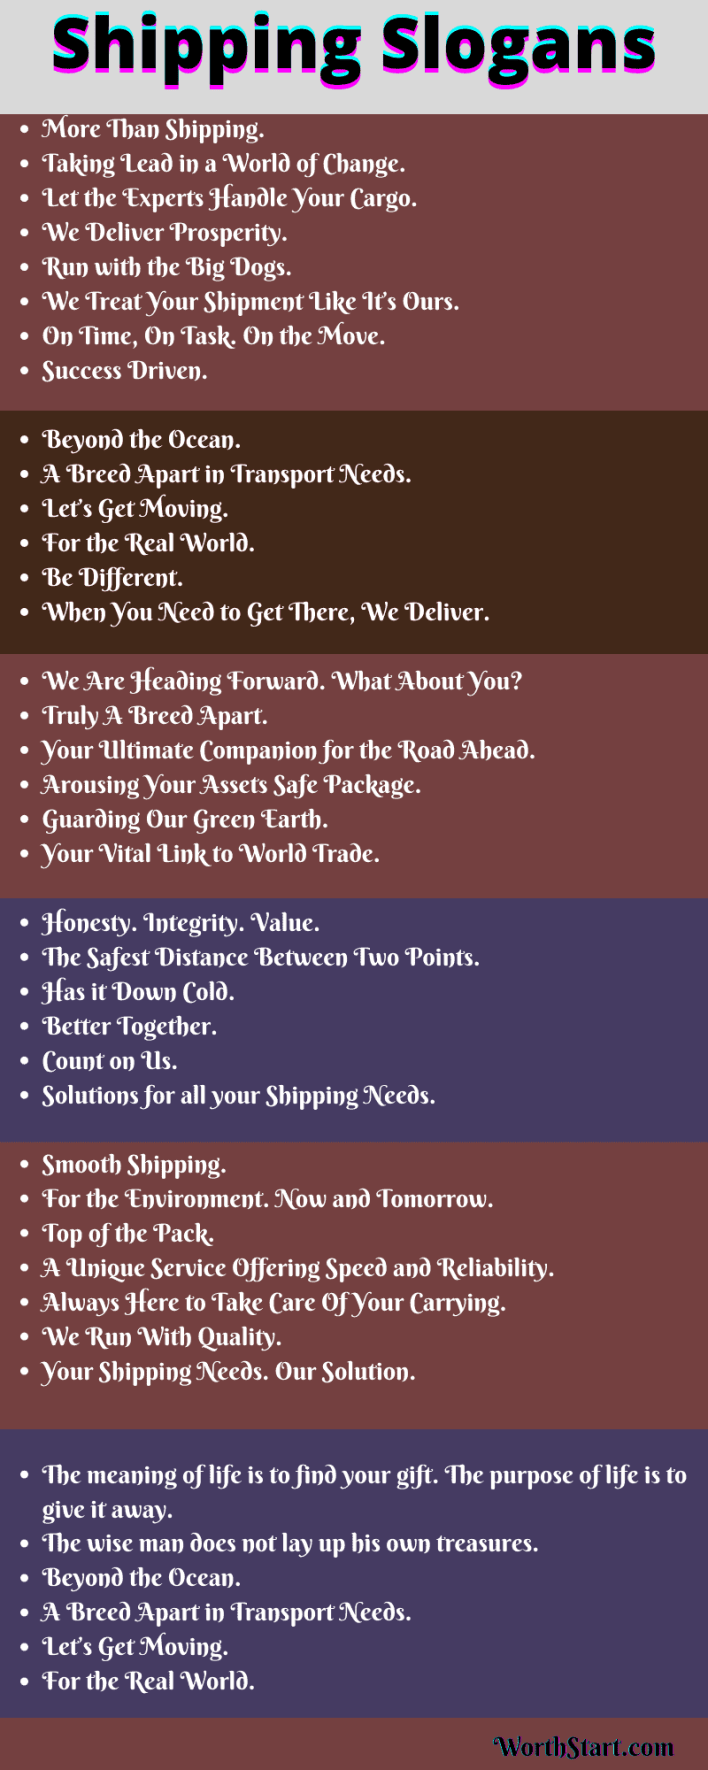 Shipping Slogans